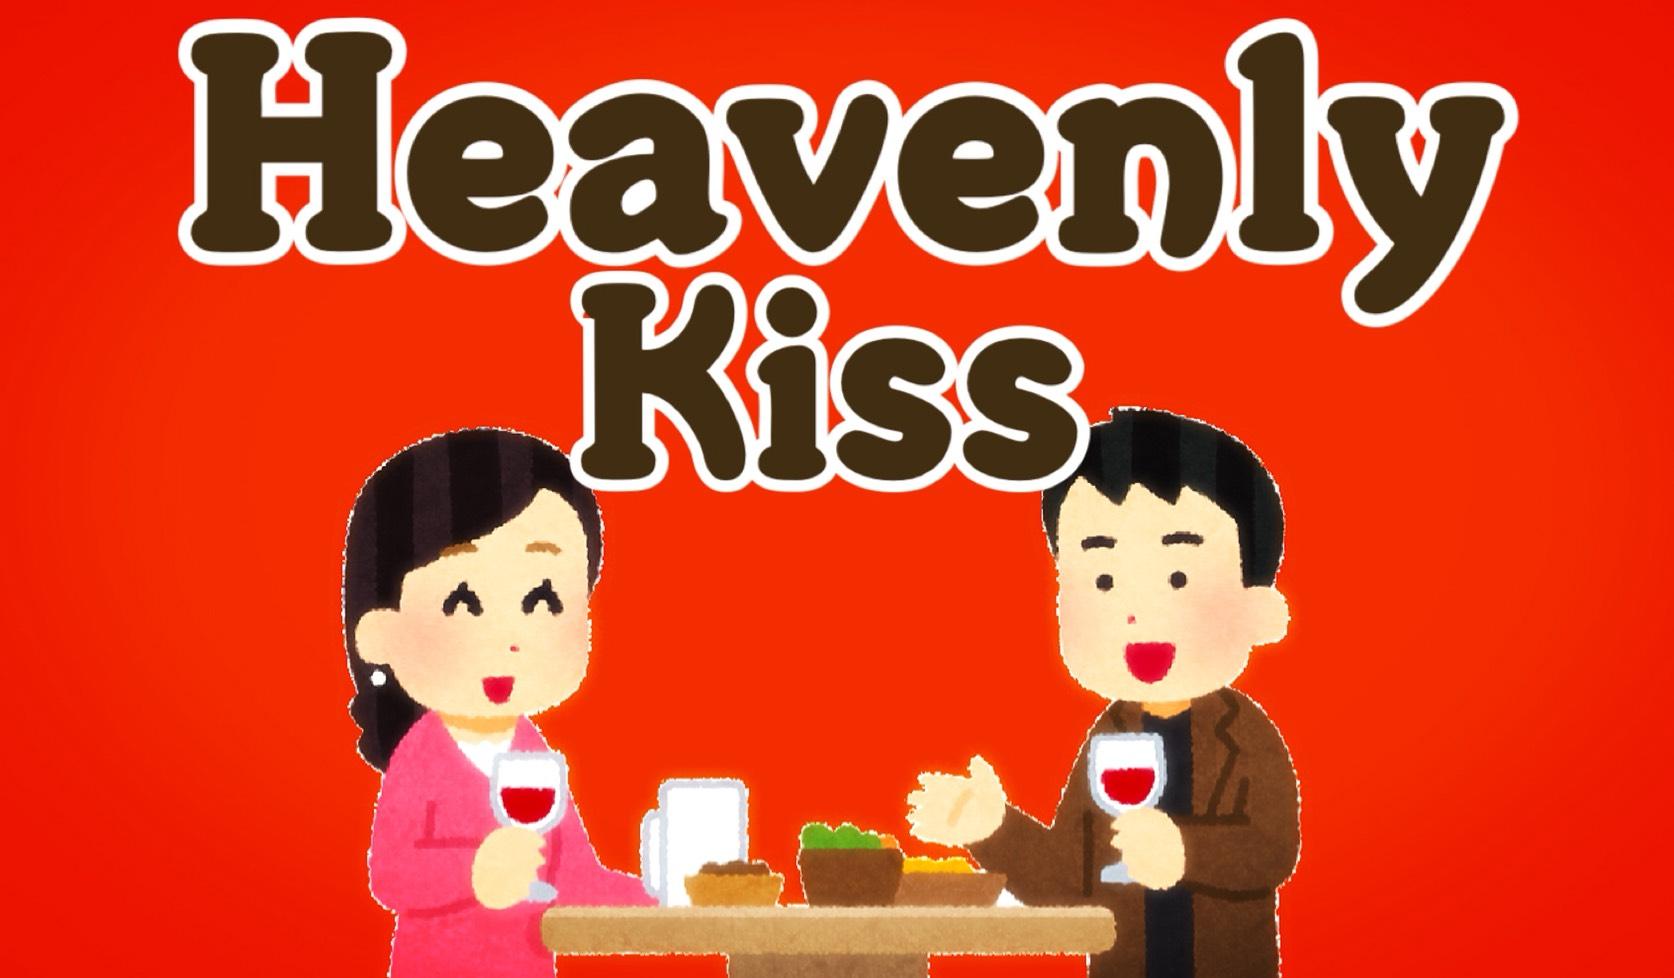 「Heavenly kiss」のイメージ